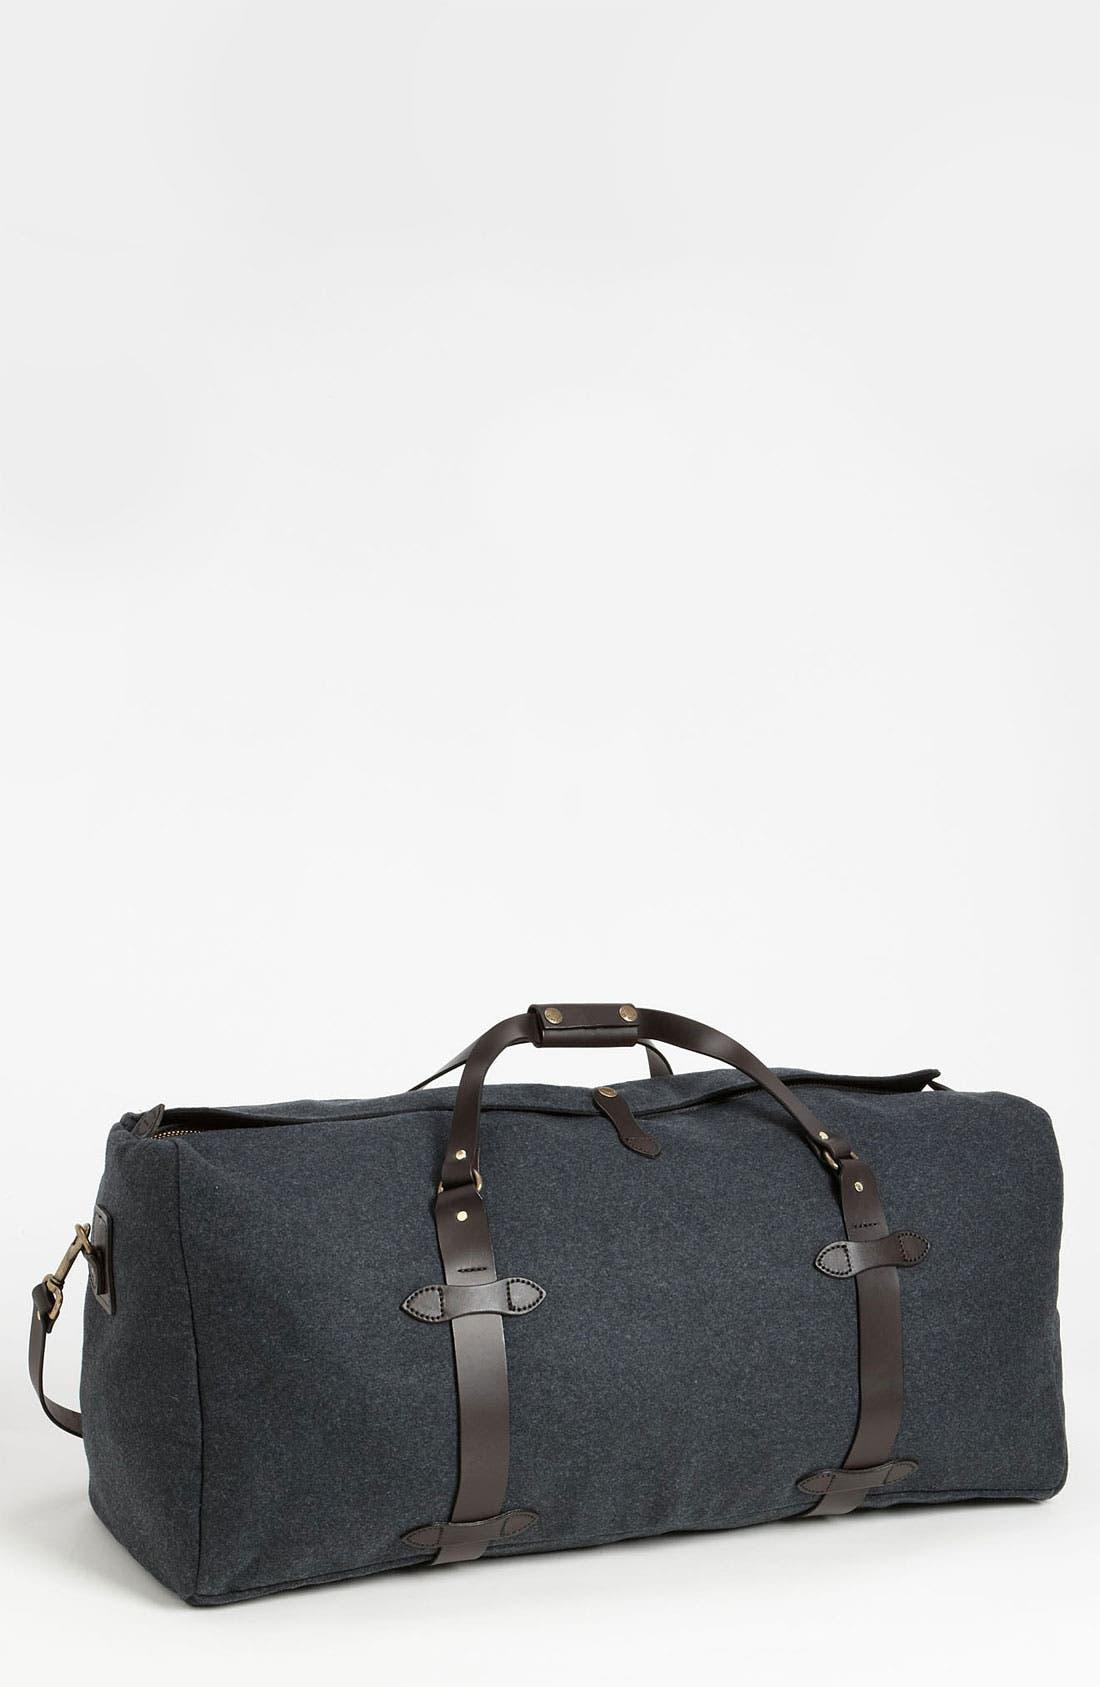 Alternate Image 1 Selected - Filson Large Wool Duffel Bag